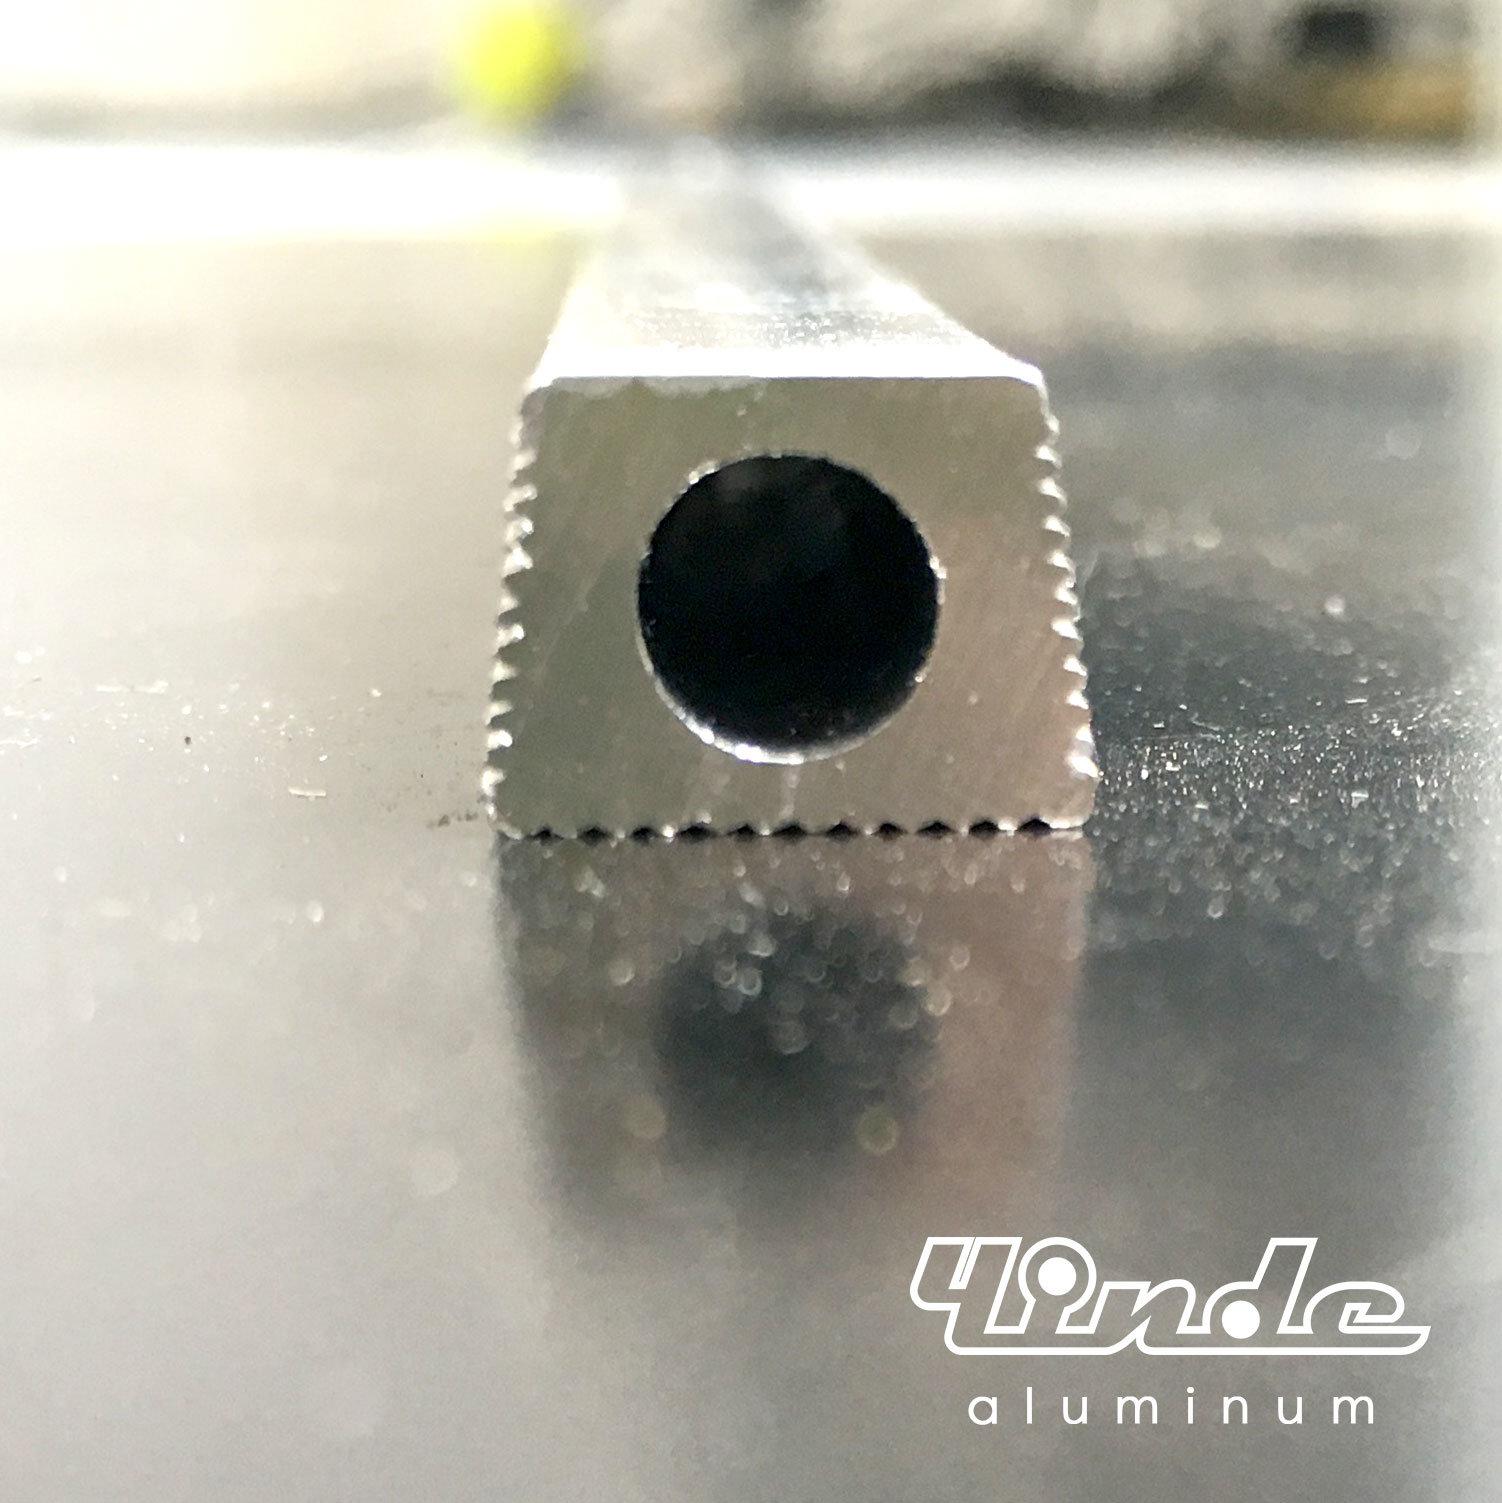 Aluminum Extrusion/Aluminium Profile with Texture on Three Sides